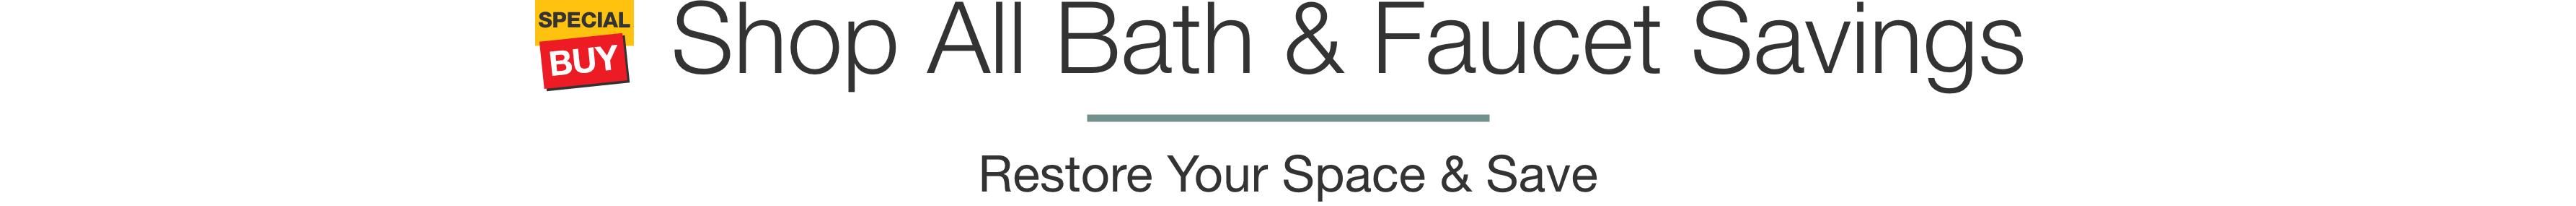 Shop All Bath & Faucet Savings section